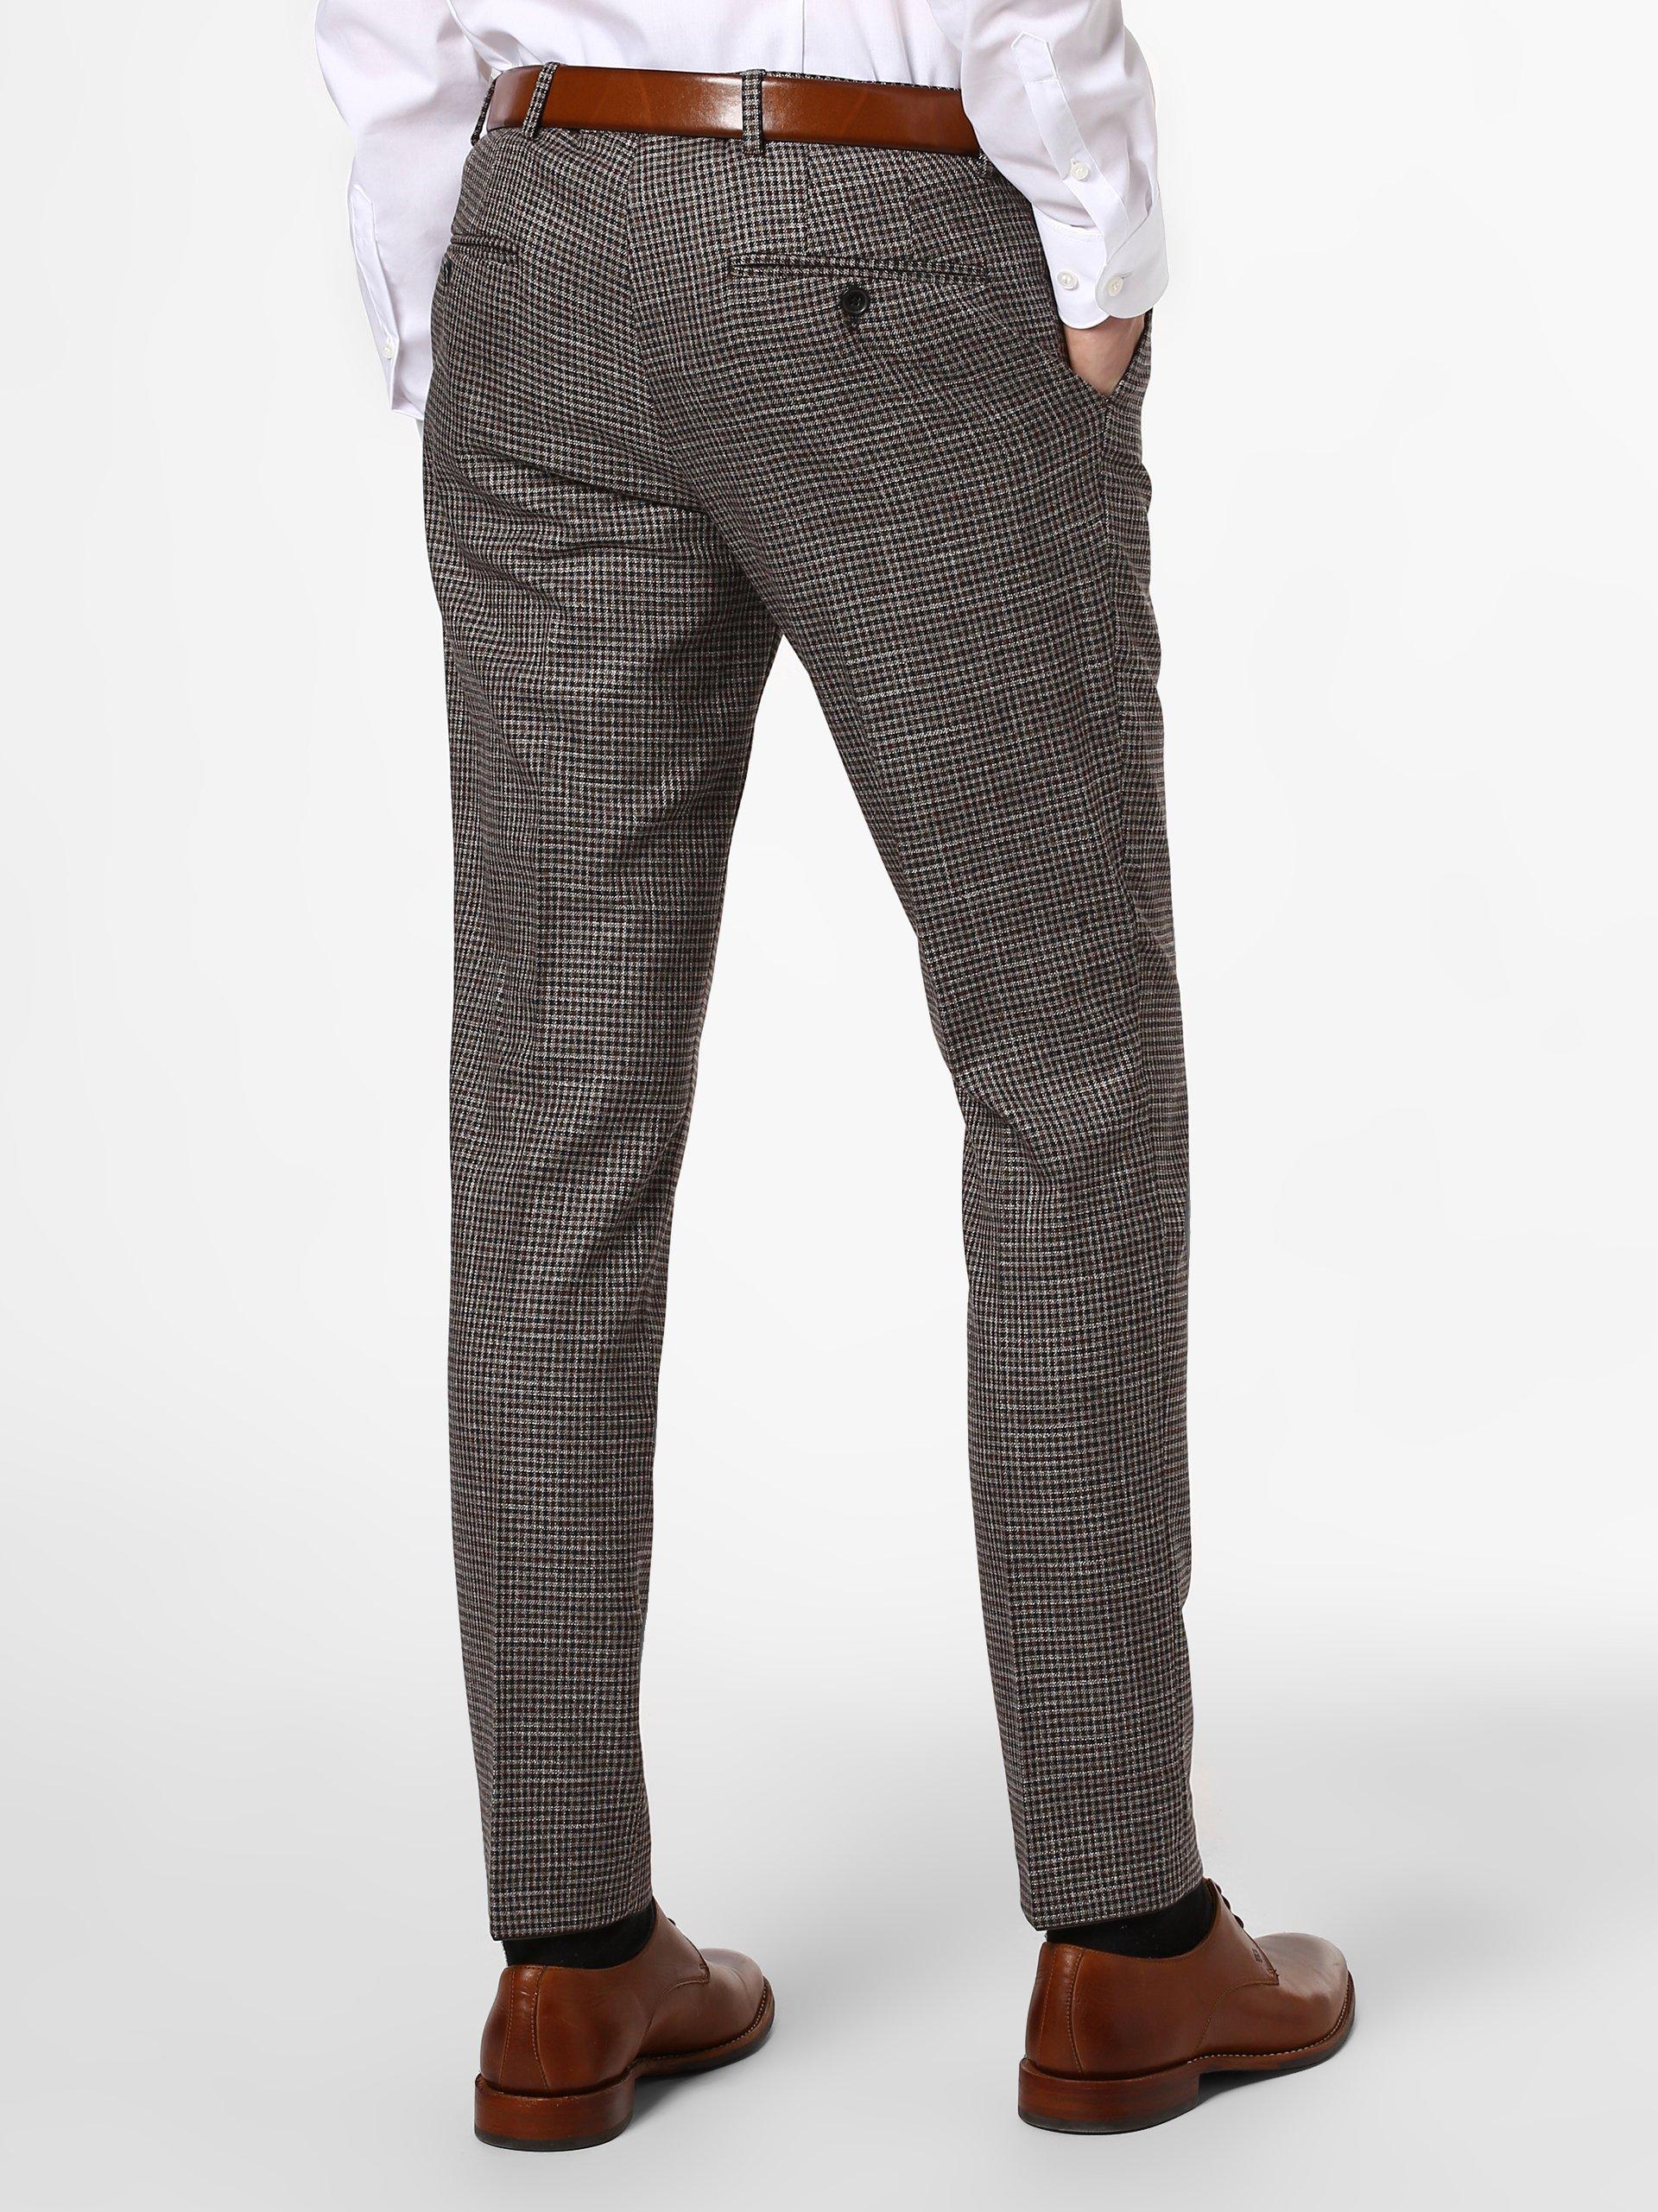 Finshley & Harding London Spodnie męskie